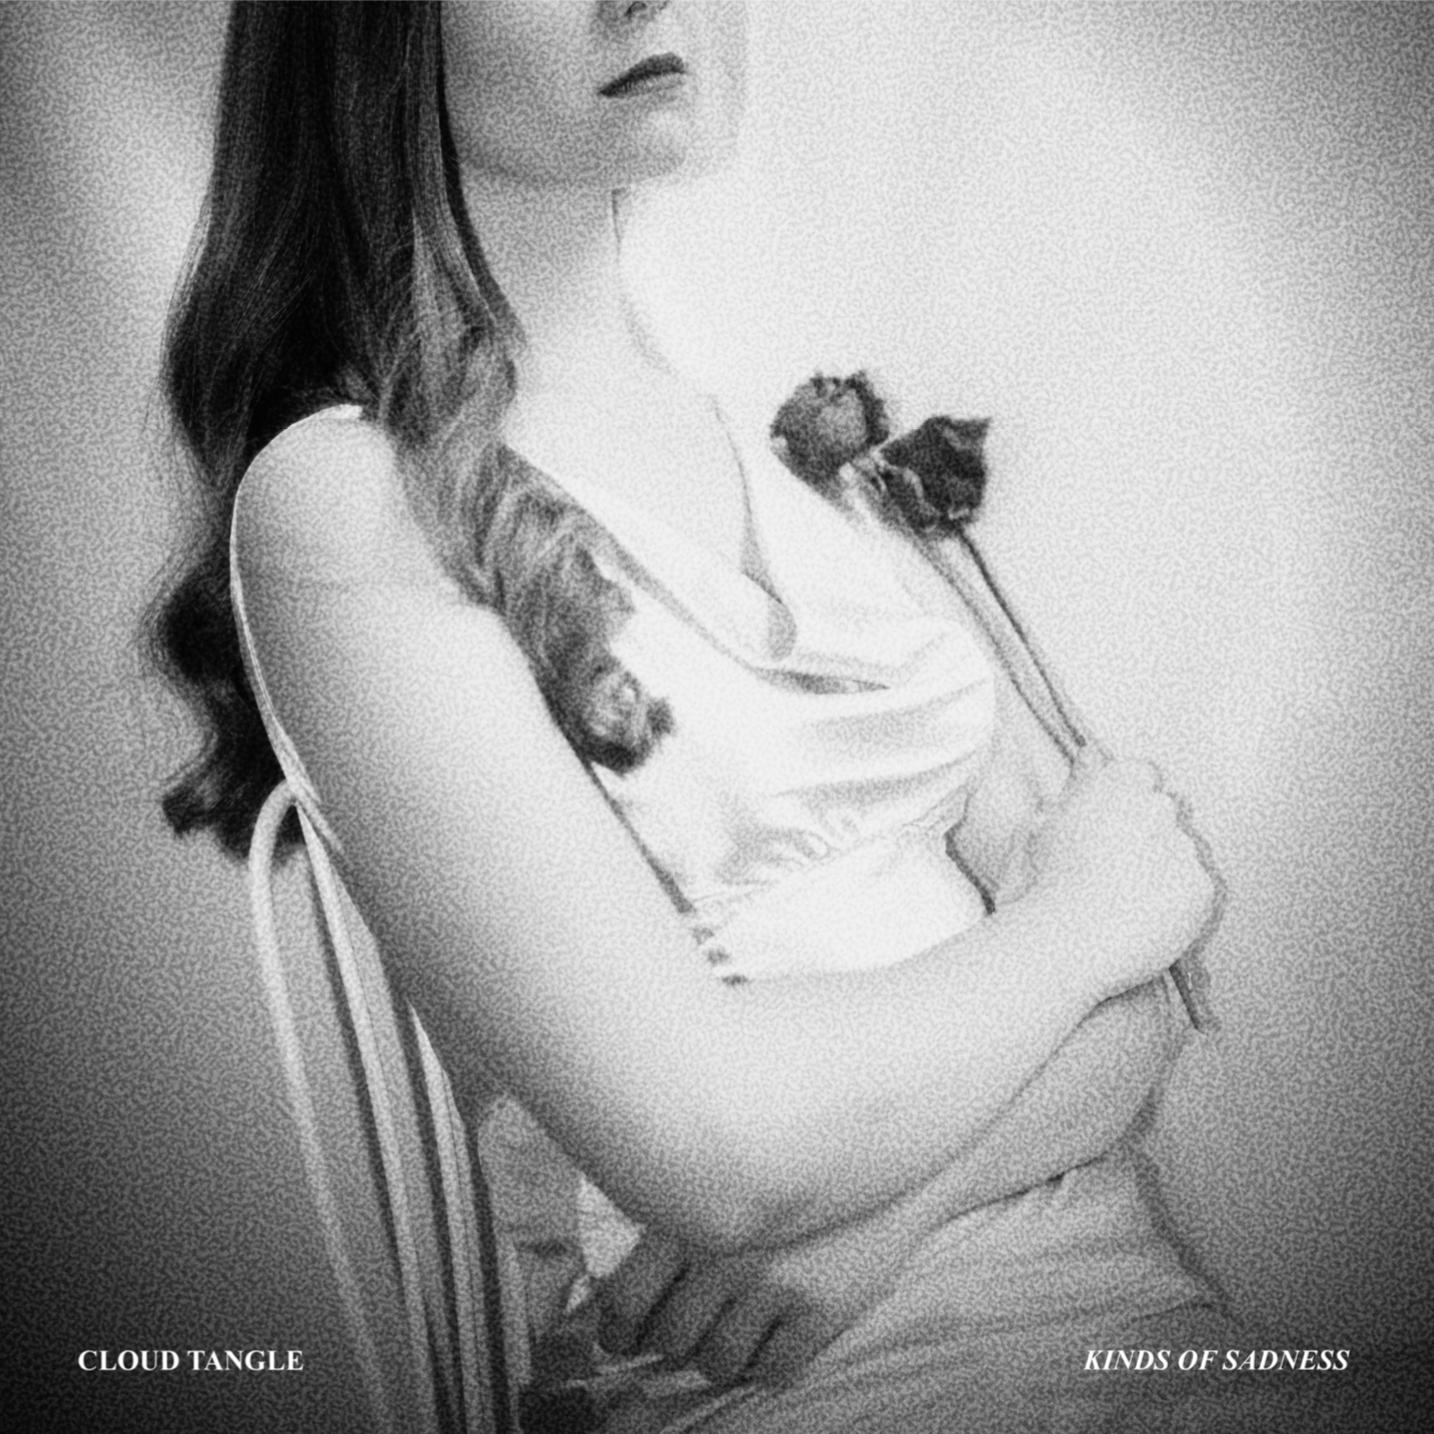 Cloud Tangle - 'Kinds of Sadness'